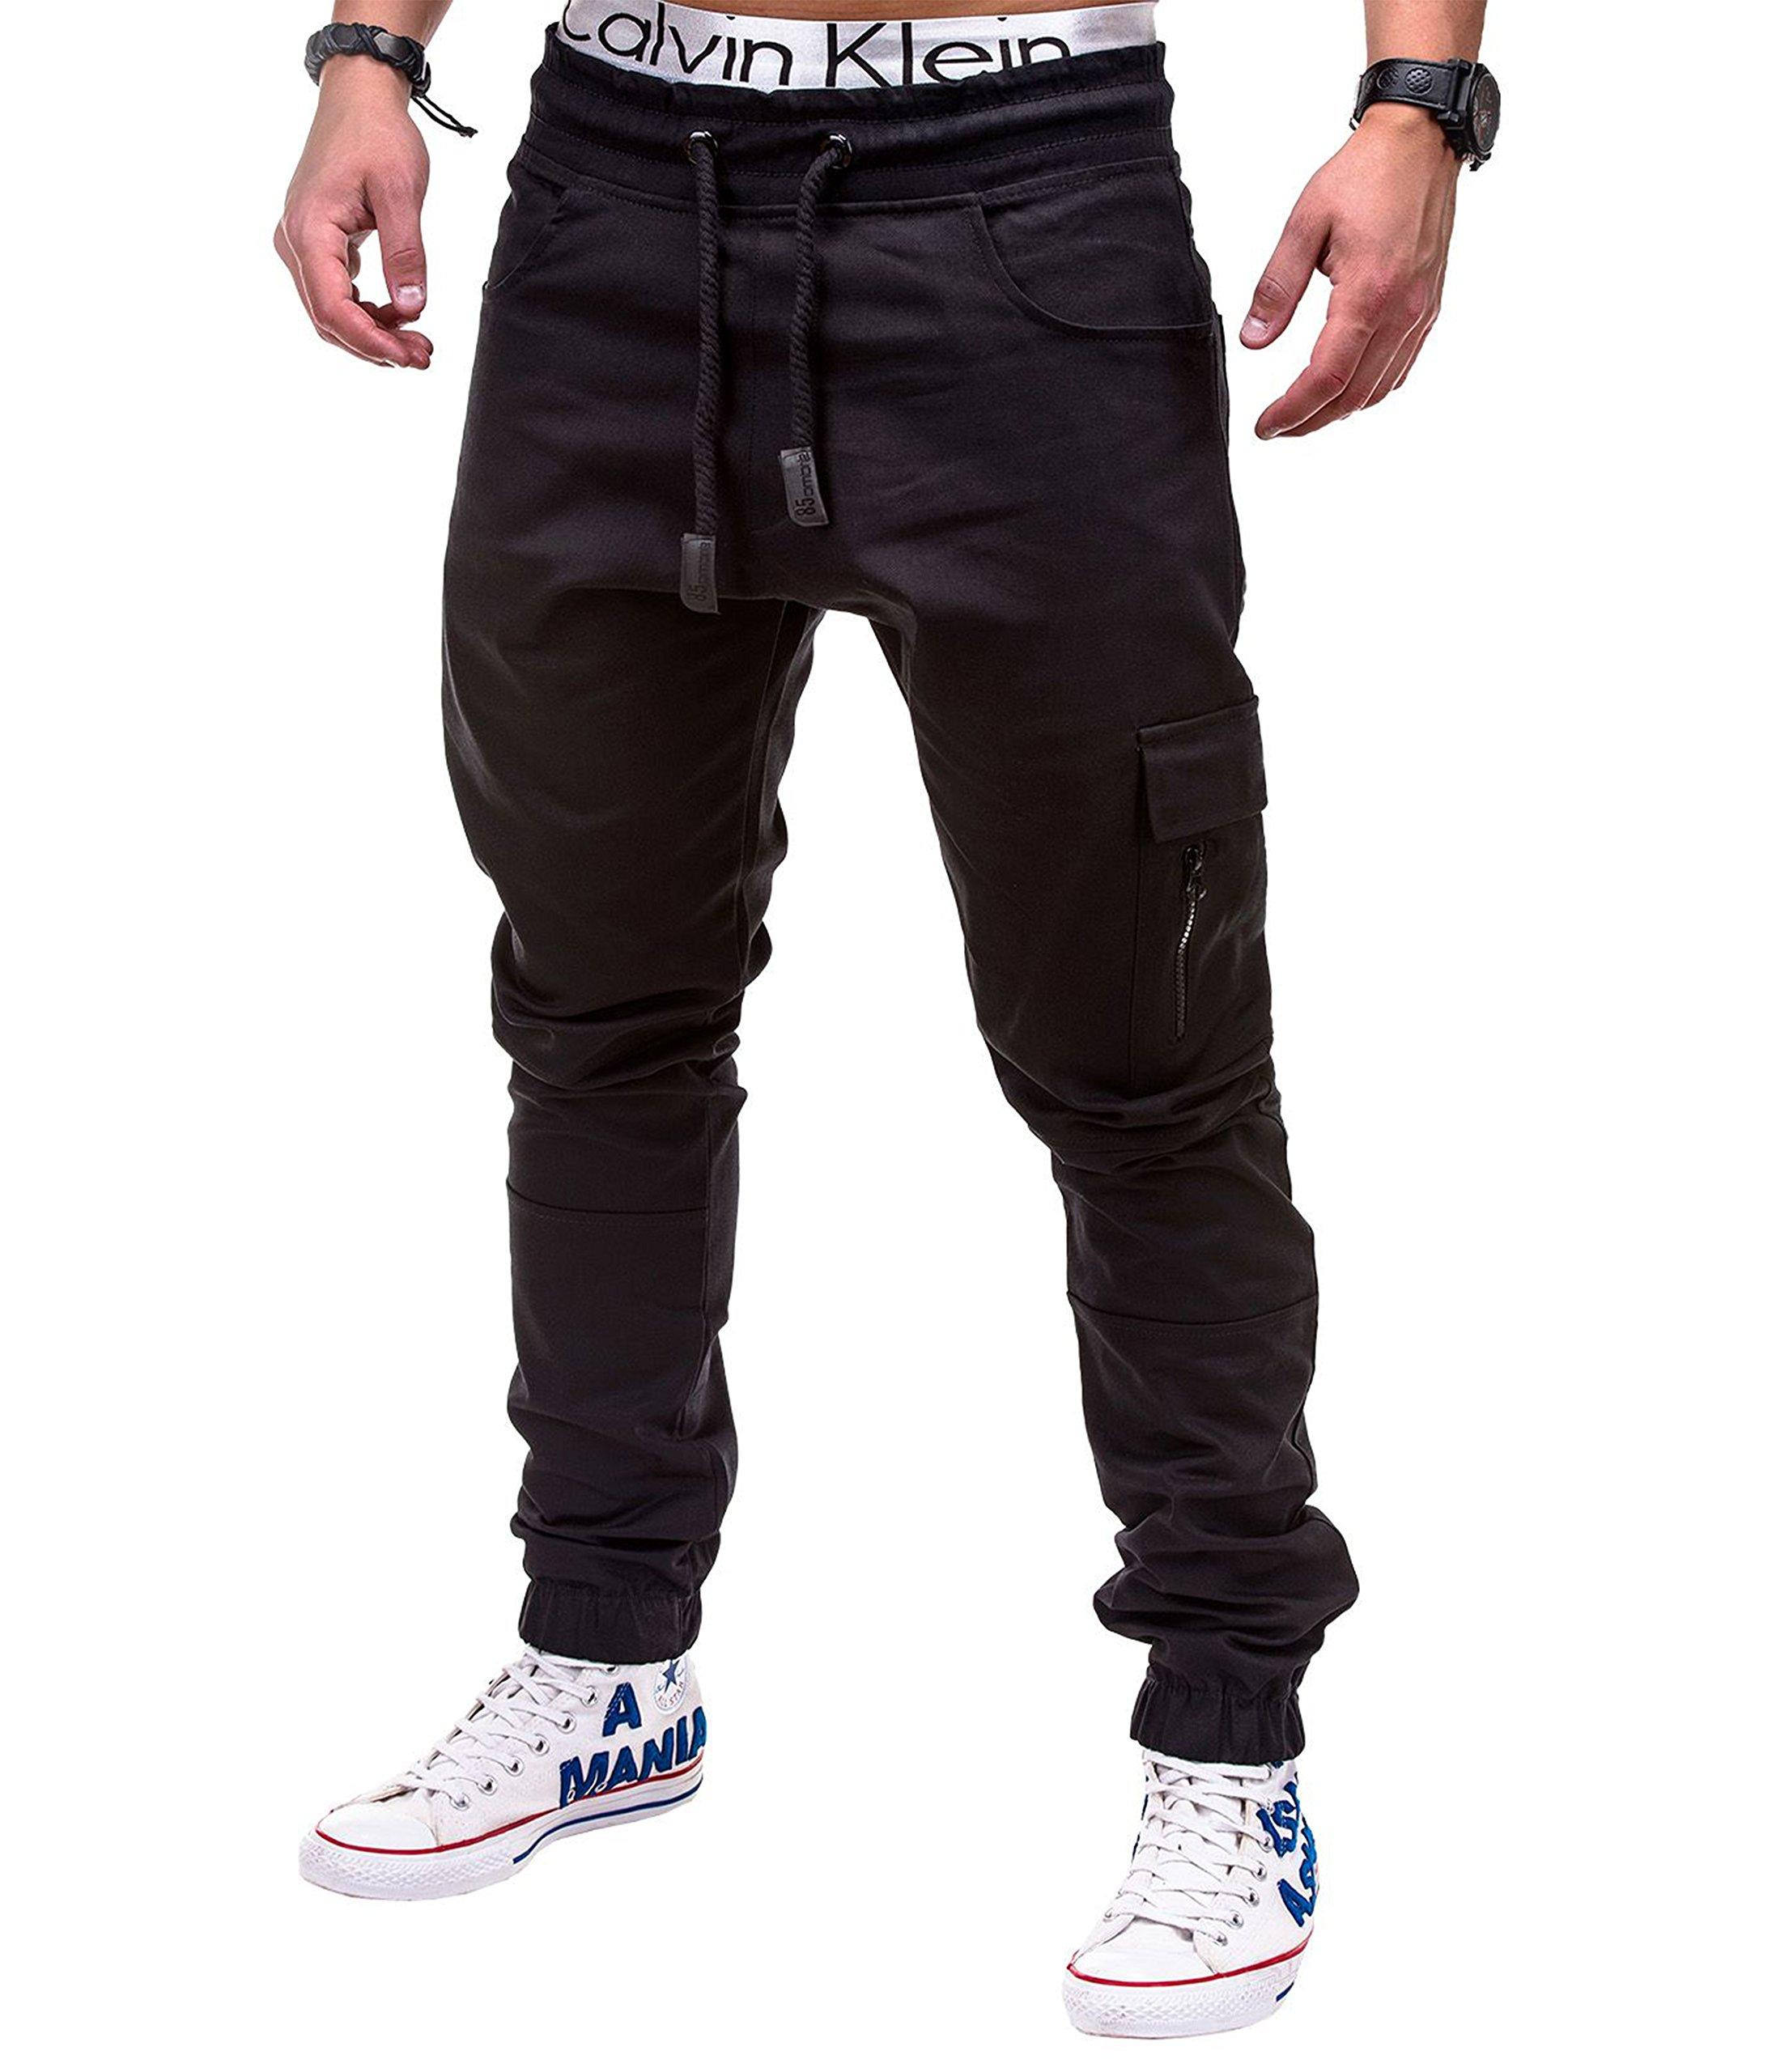 BetterStylz MasonBZ Zip Cargo Chino Jogger Men´s Pants Harem Style Trousers Exercising In Various Colors (S-XXL) (XX-Large, Black)